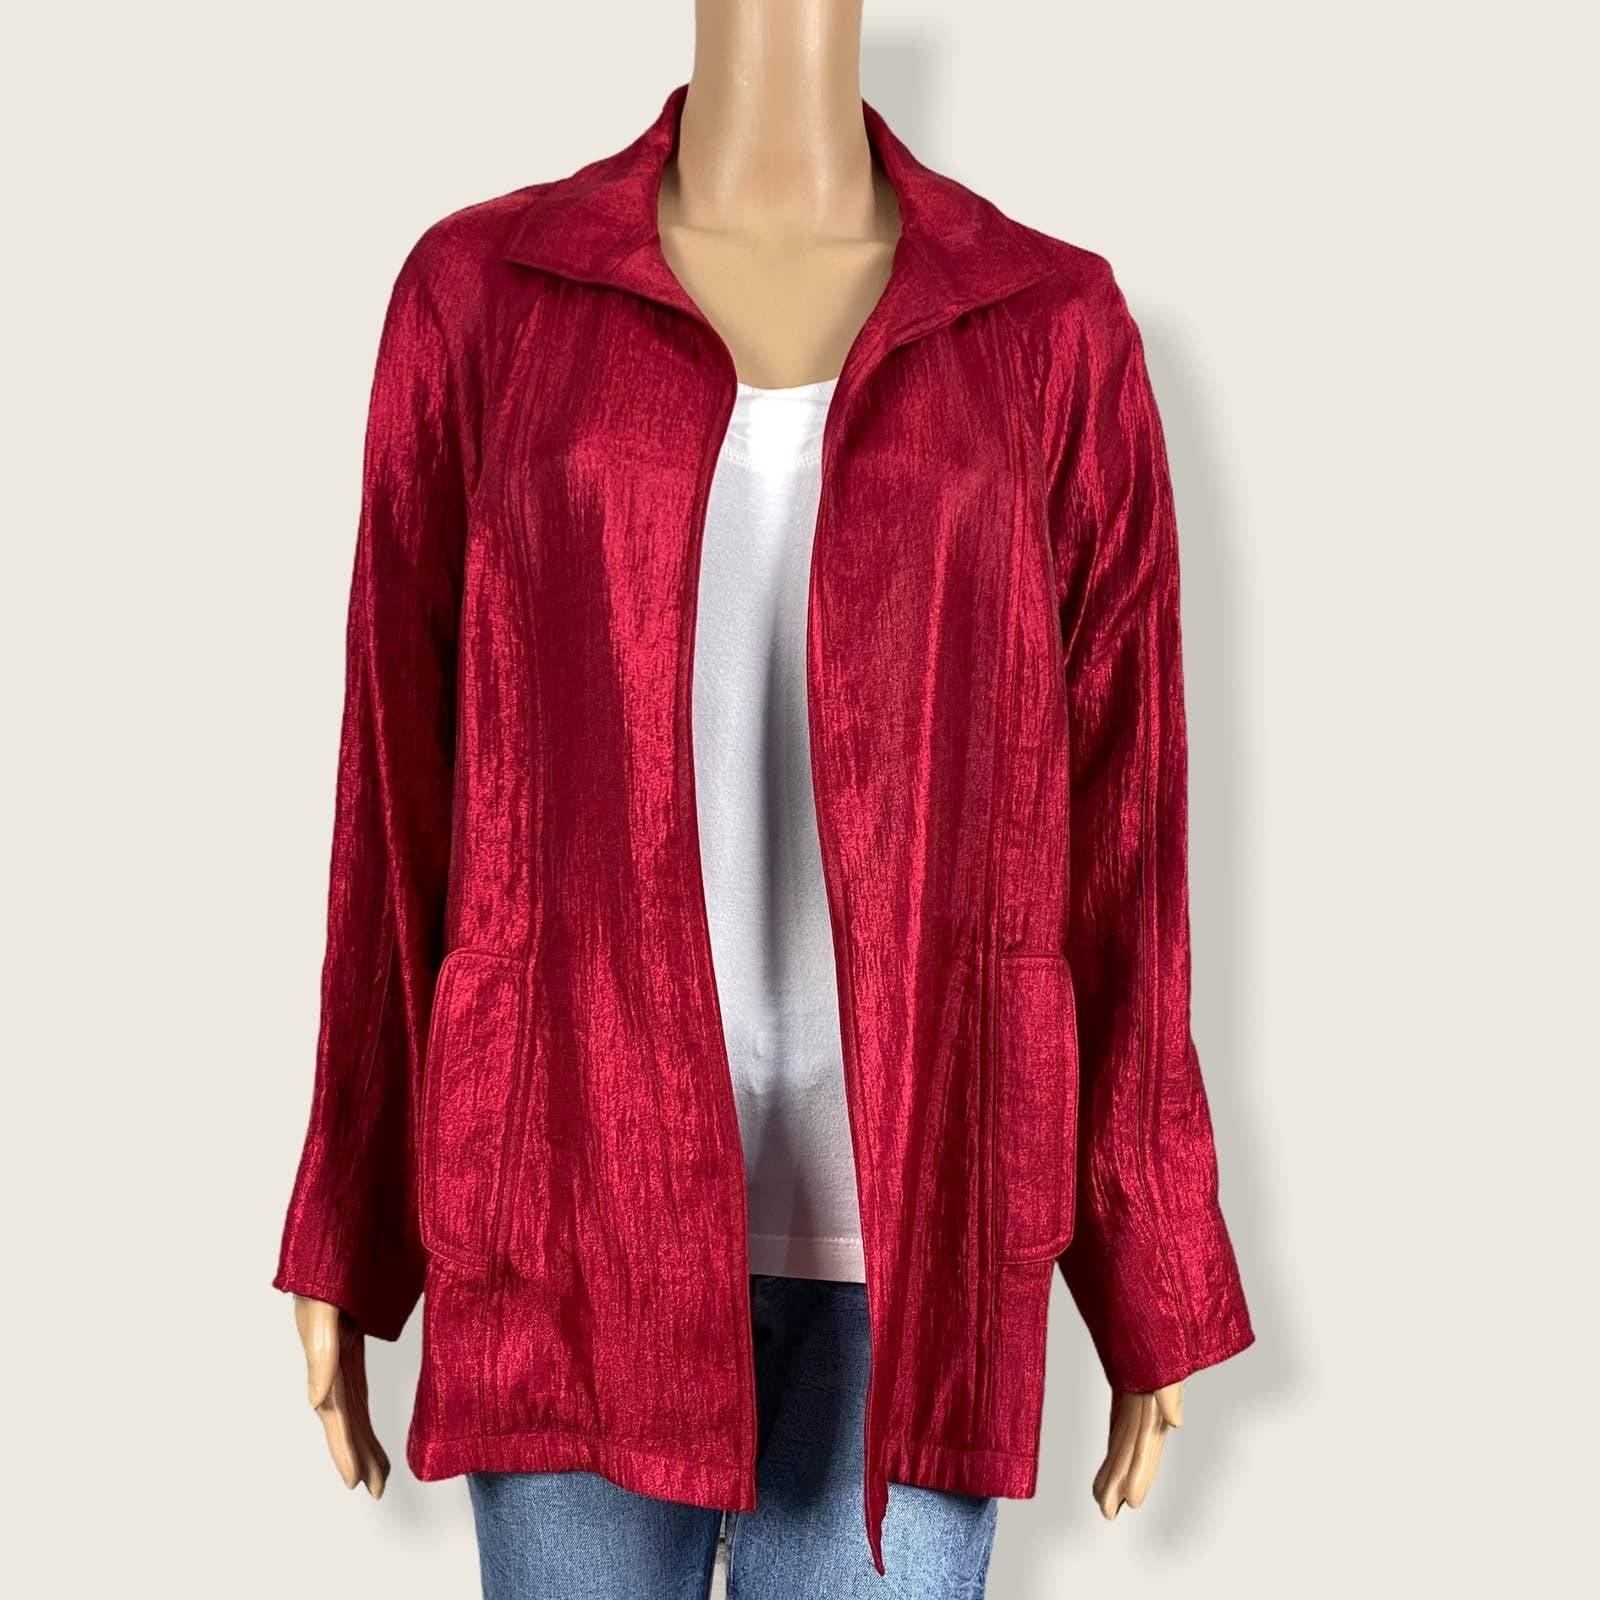 Chico's Blazer Jacket Shiny Red Metallic